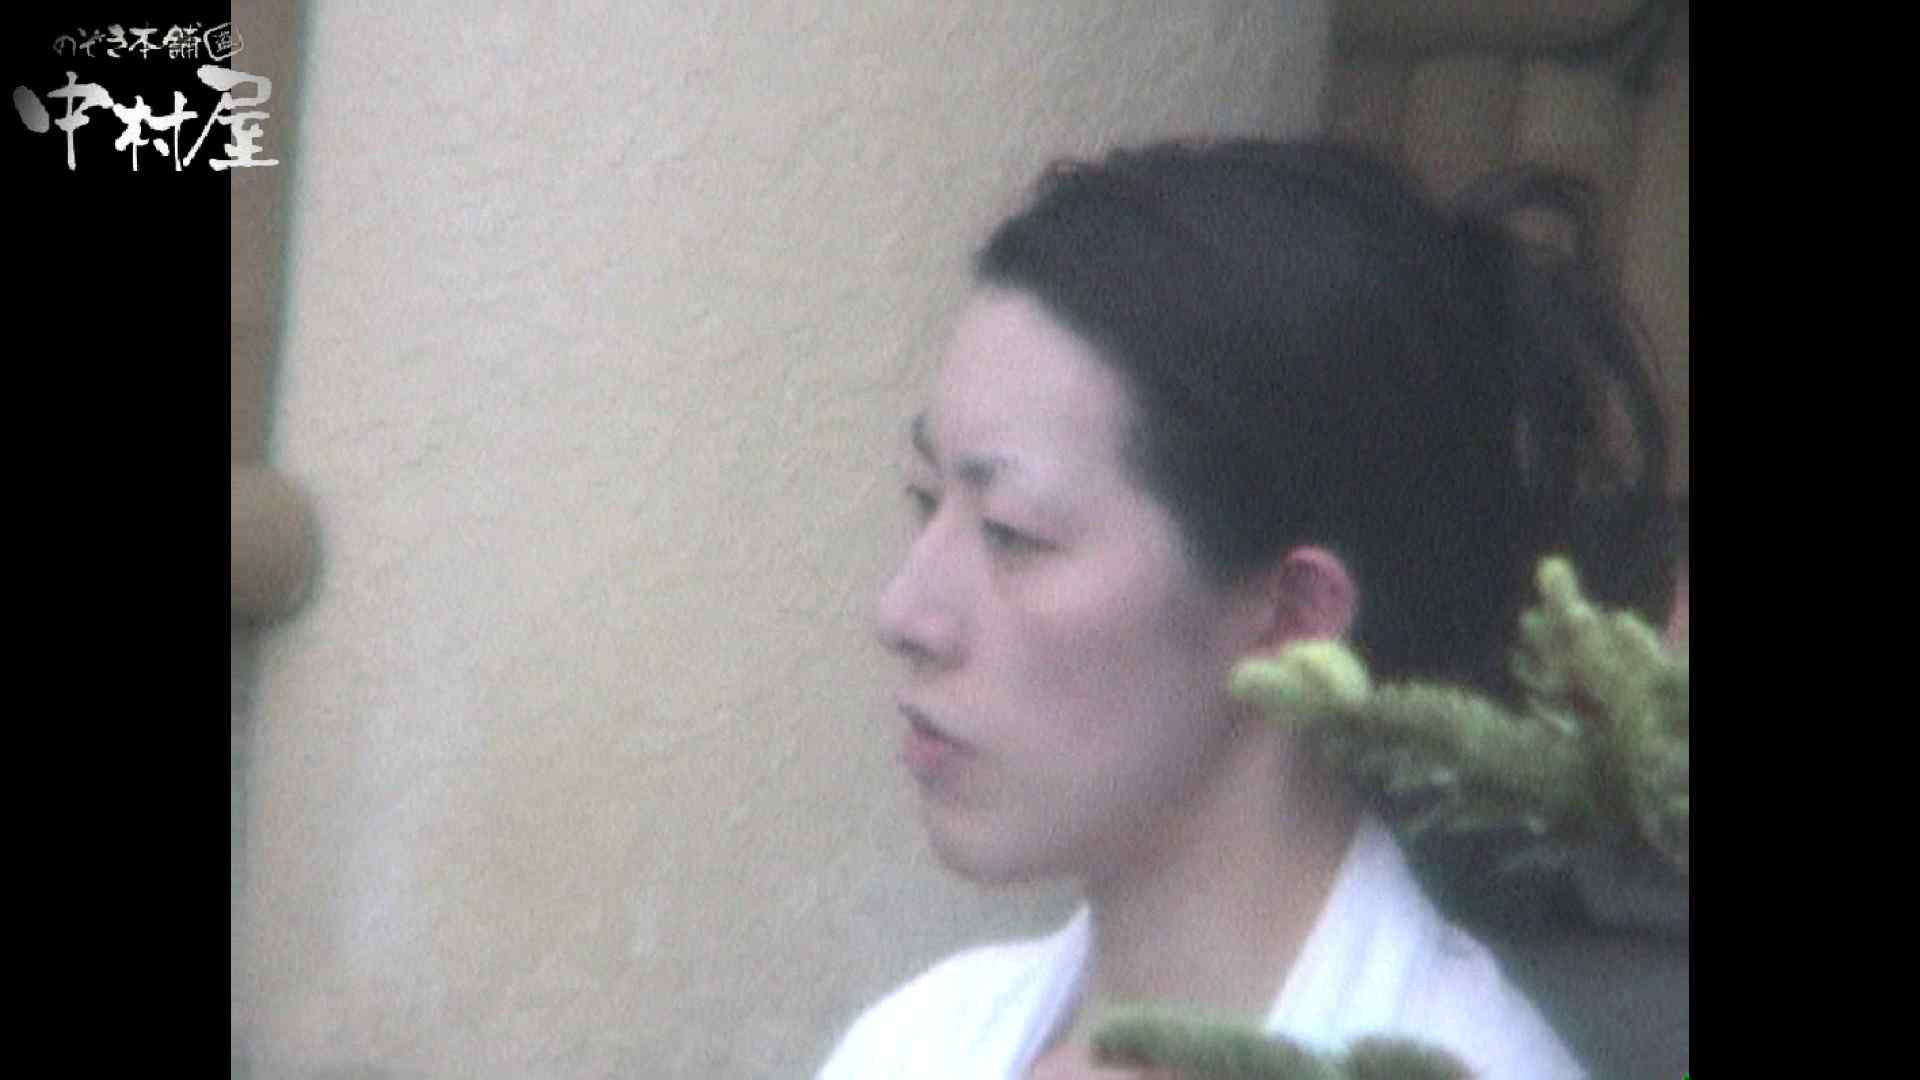 Aquaな露天風呂Vol.960 OLセックス 盗撮セックス無修正動画無料 65画像 11